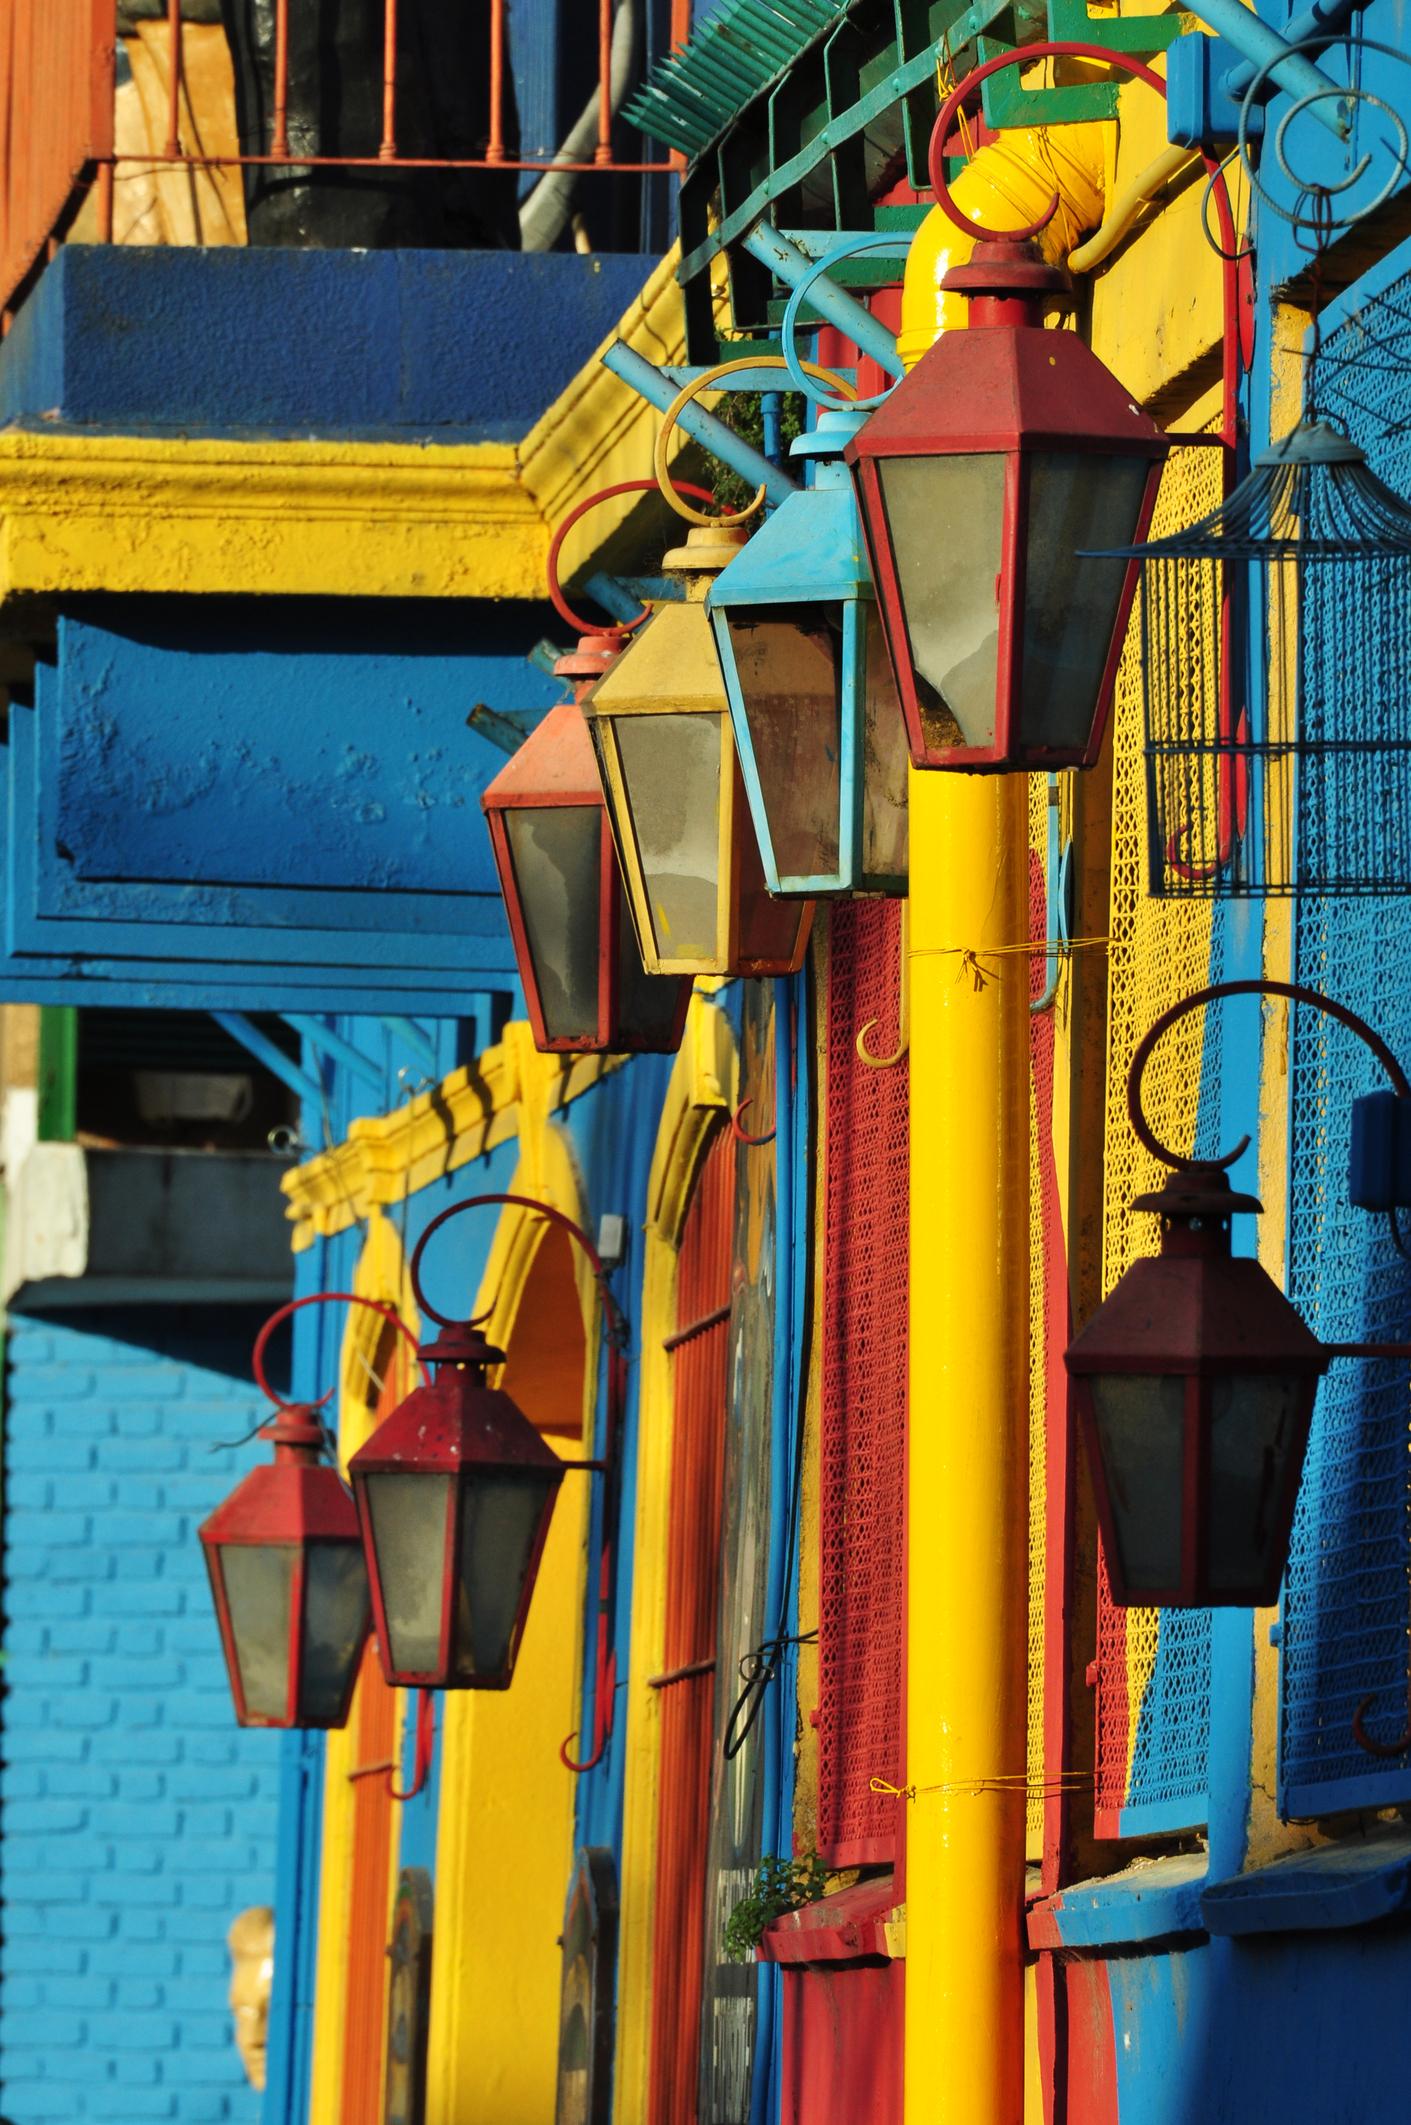 A city of colors